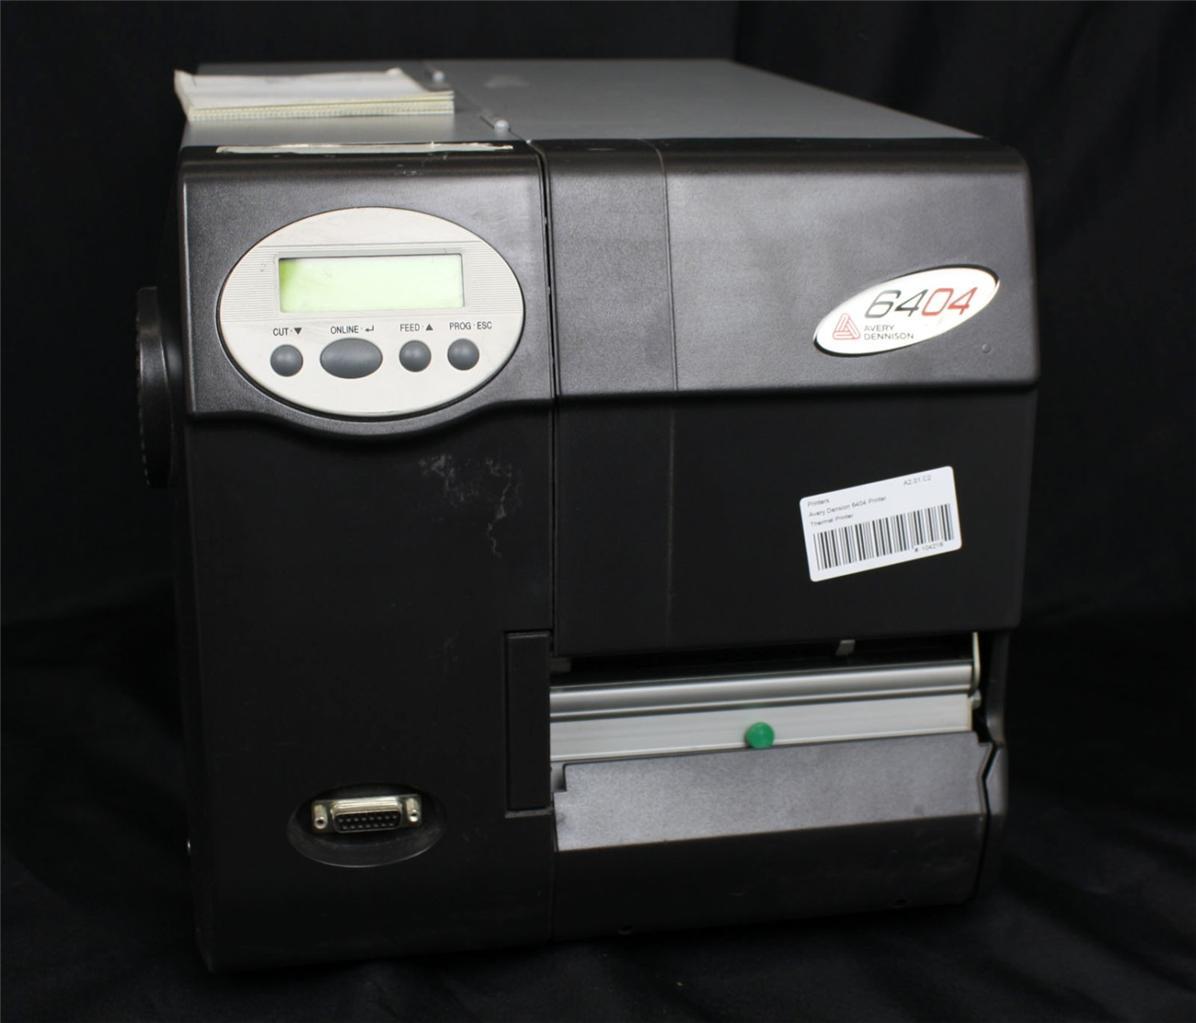 Custom Card Template avery label printer : Avery Dennison 6404 Printer Label Thermal Printer : eBay